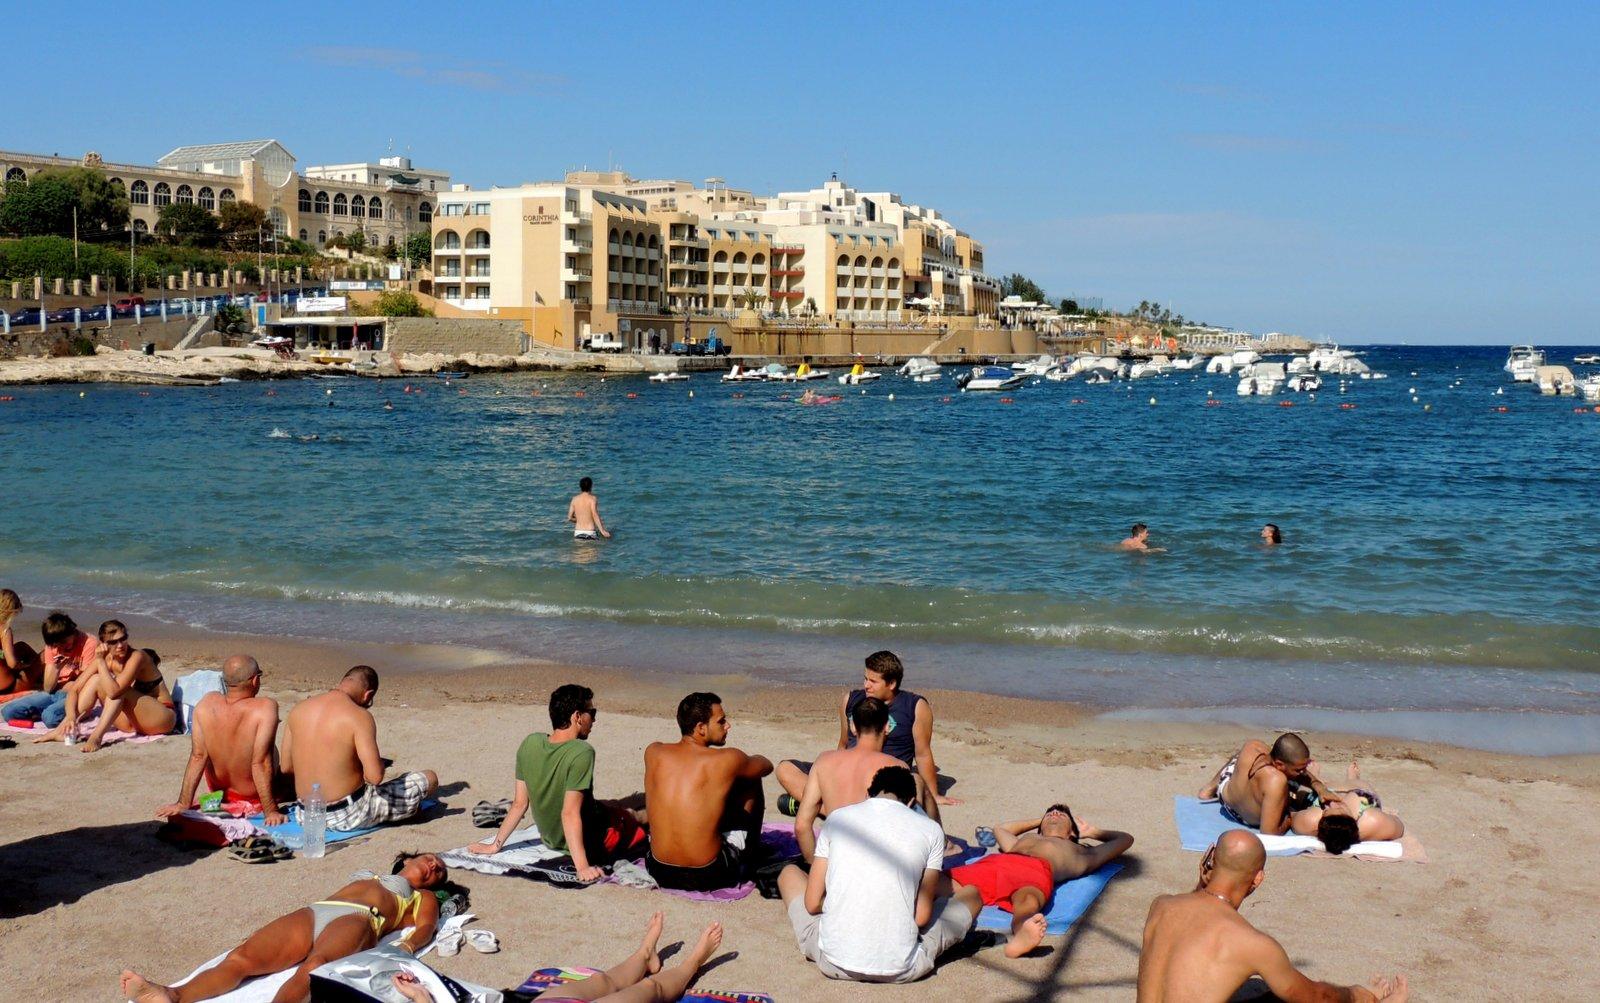 Marina Hotel at the Corinthian Beach Resort Malta